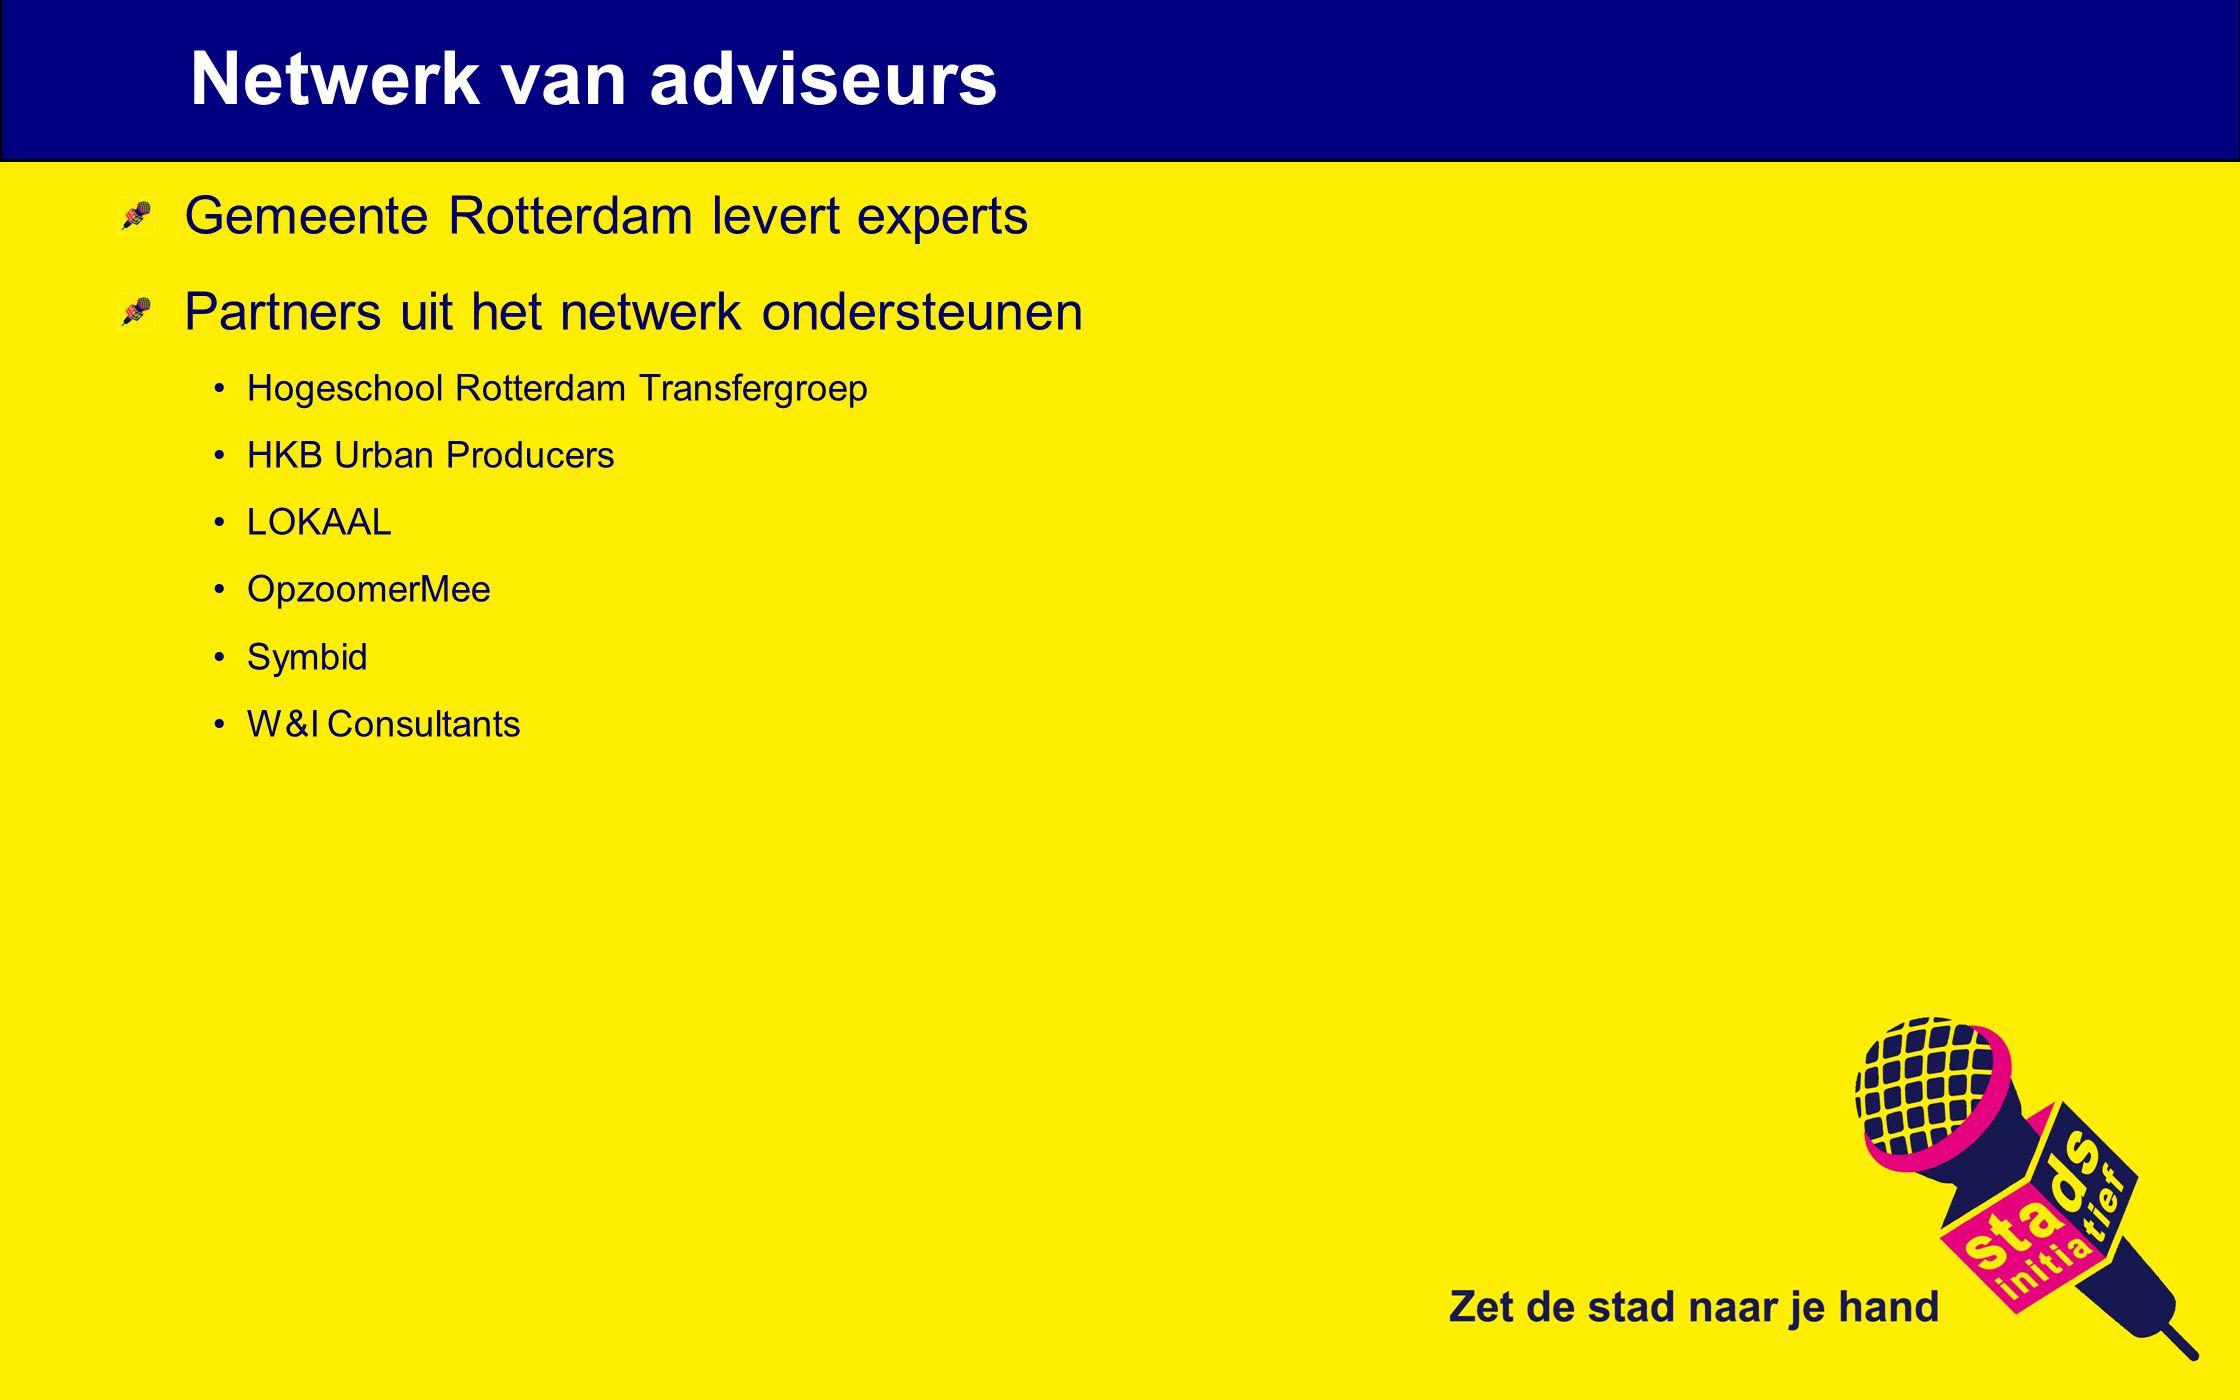 Gemeente Rotterdam levert experts Partners uit het netwerk ondersteunen Hogeschool Rotterdam Transfergroep HKB Urban Producers LOKAAL OpzoomerMee Symbid W&I Consultants Netwerk van adviseurs